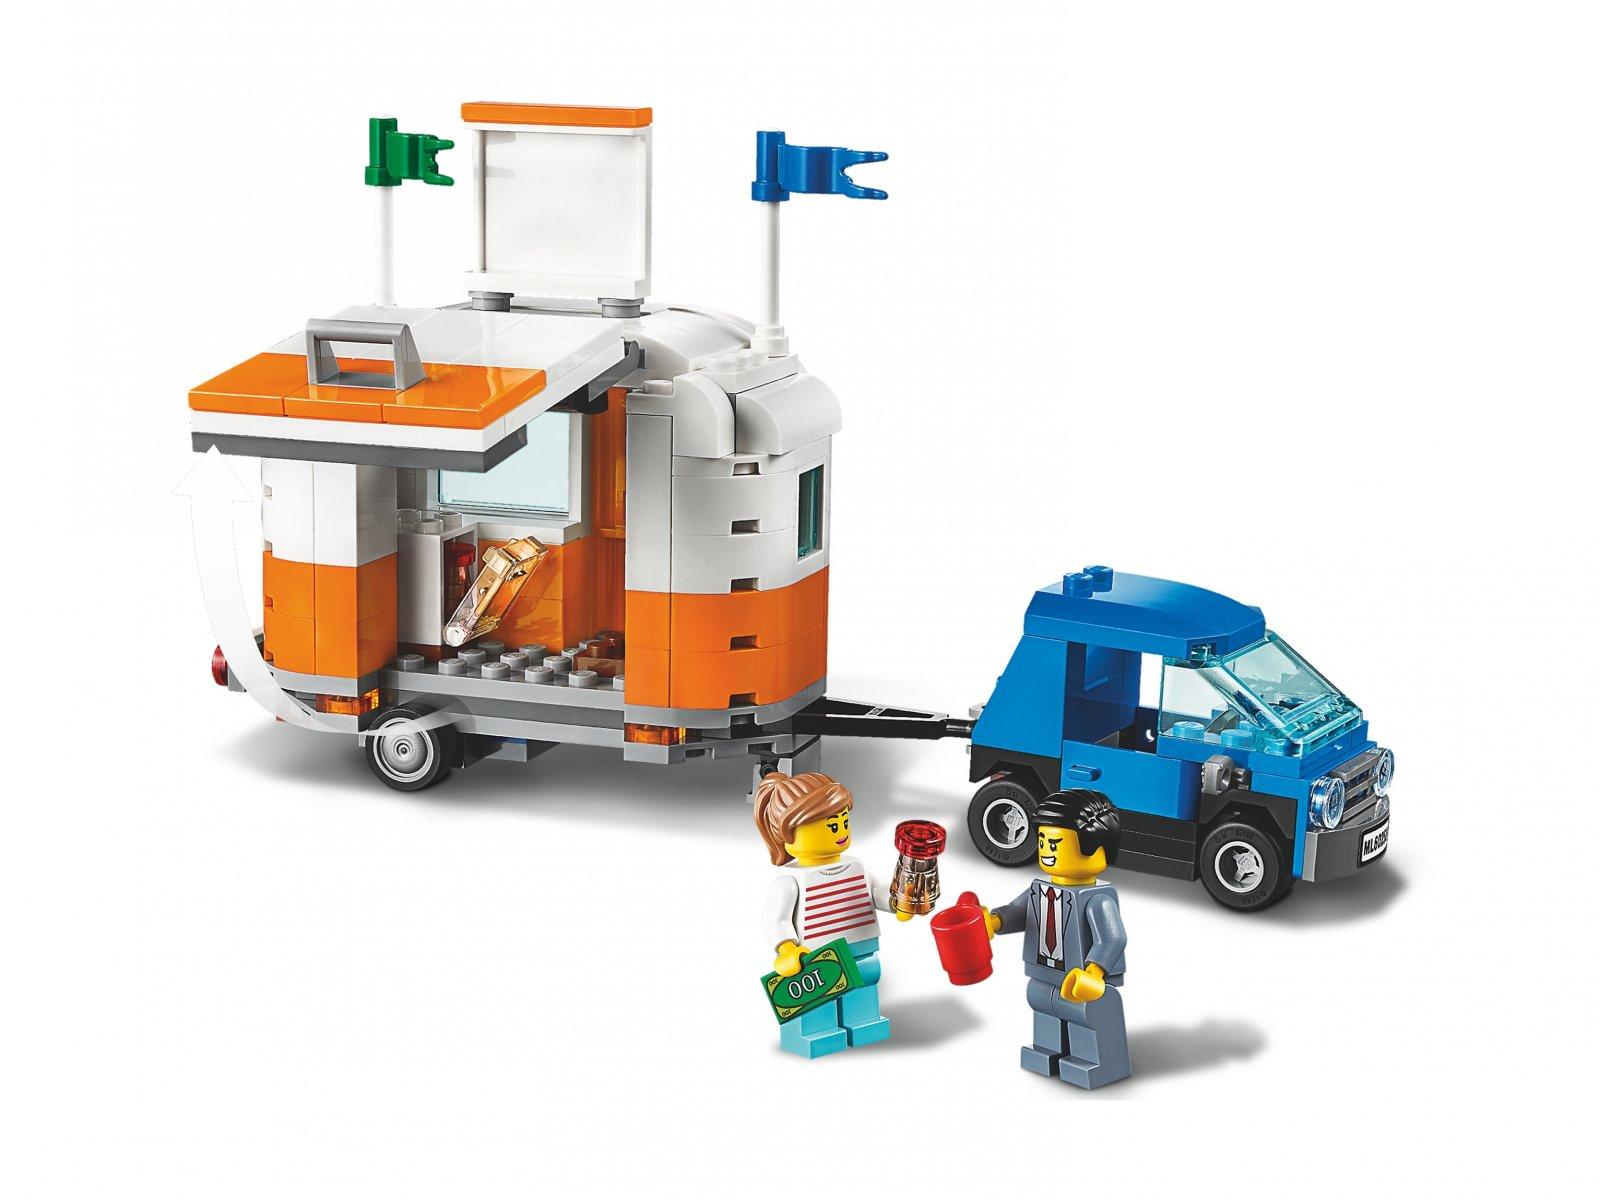 LEGO 60258 City Warsztat tuningowy